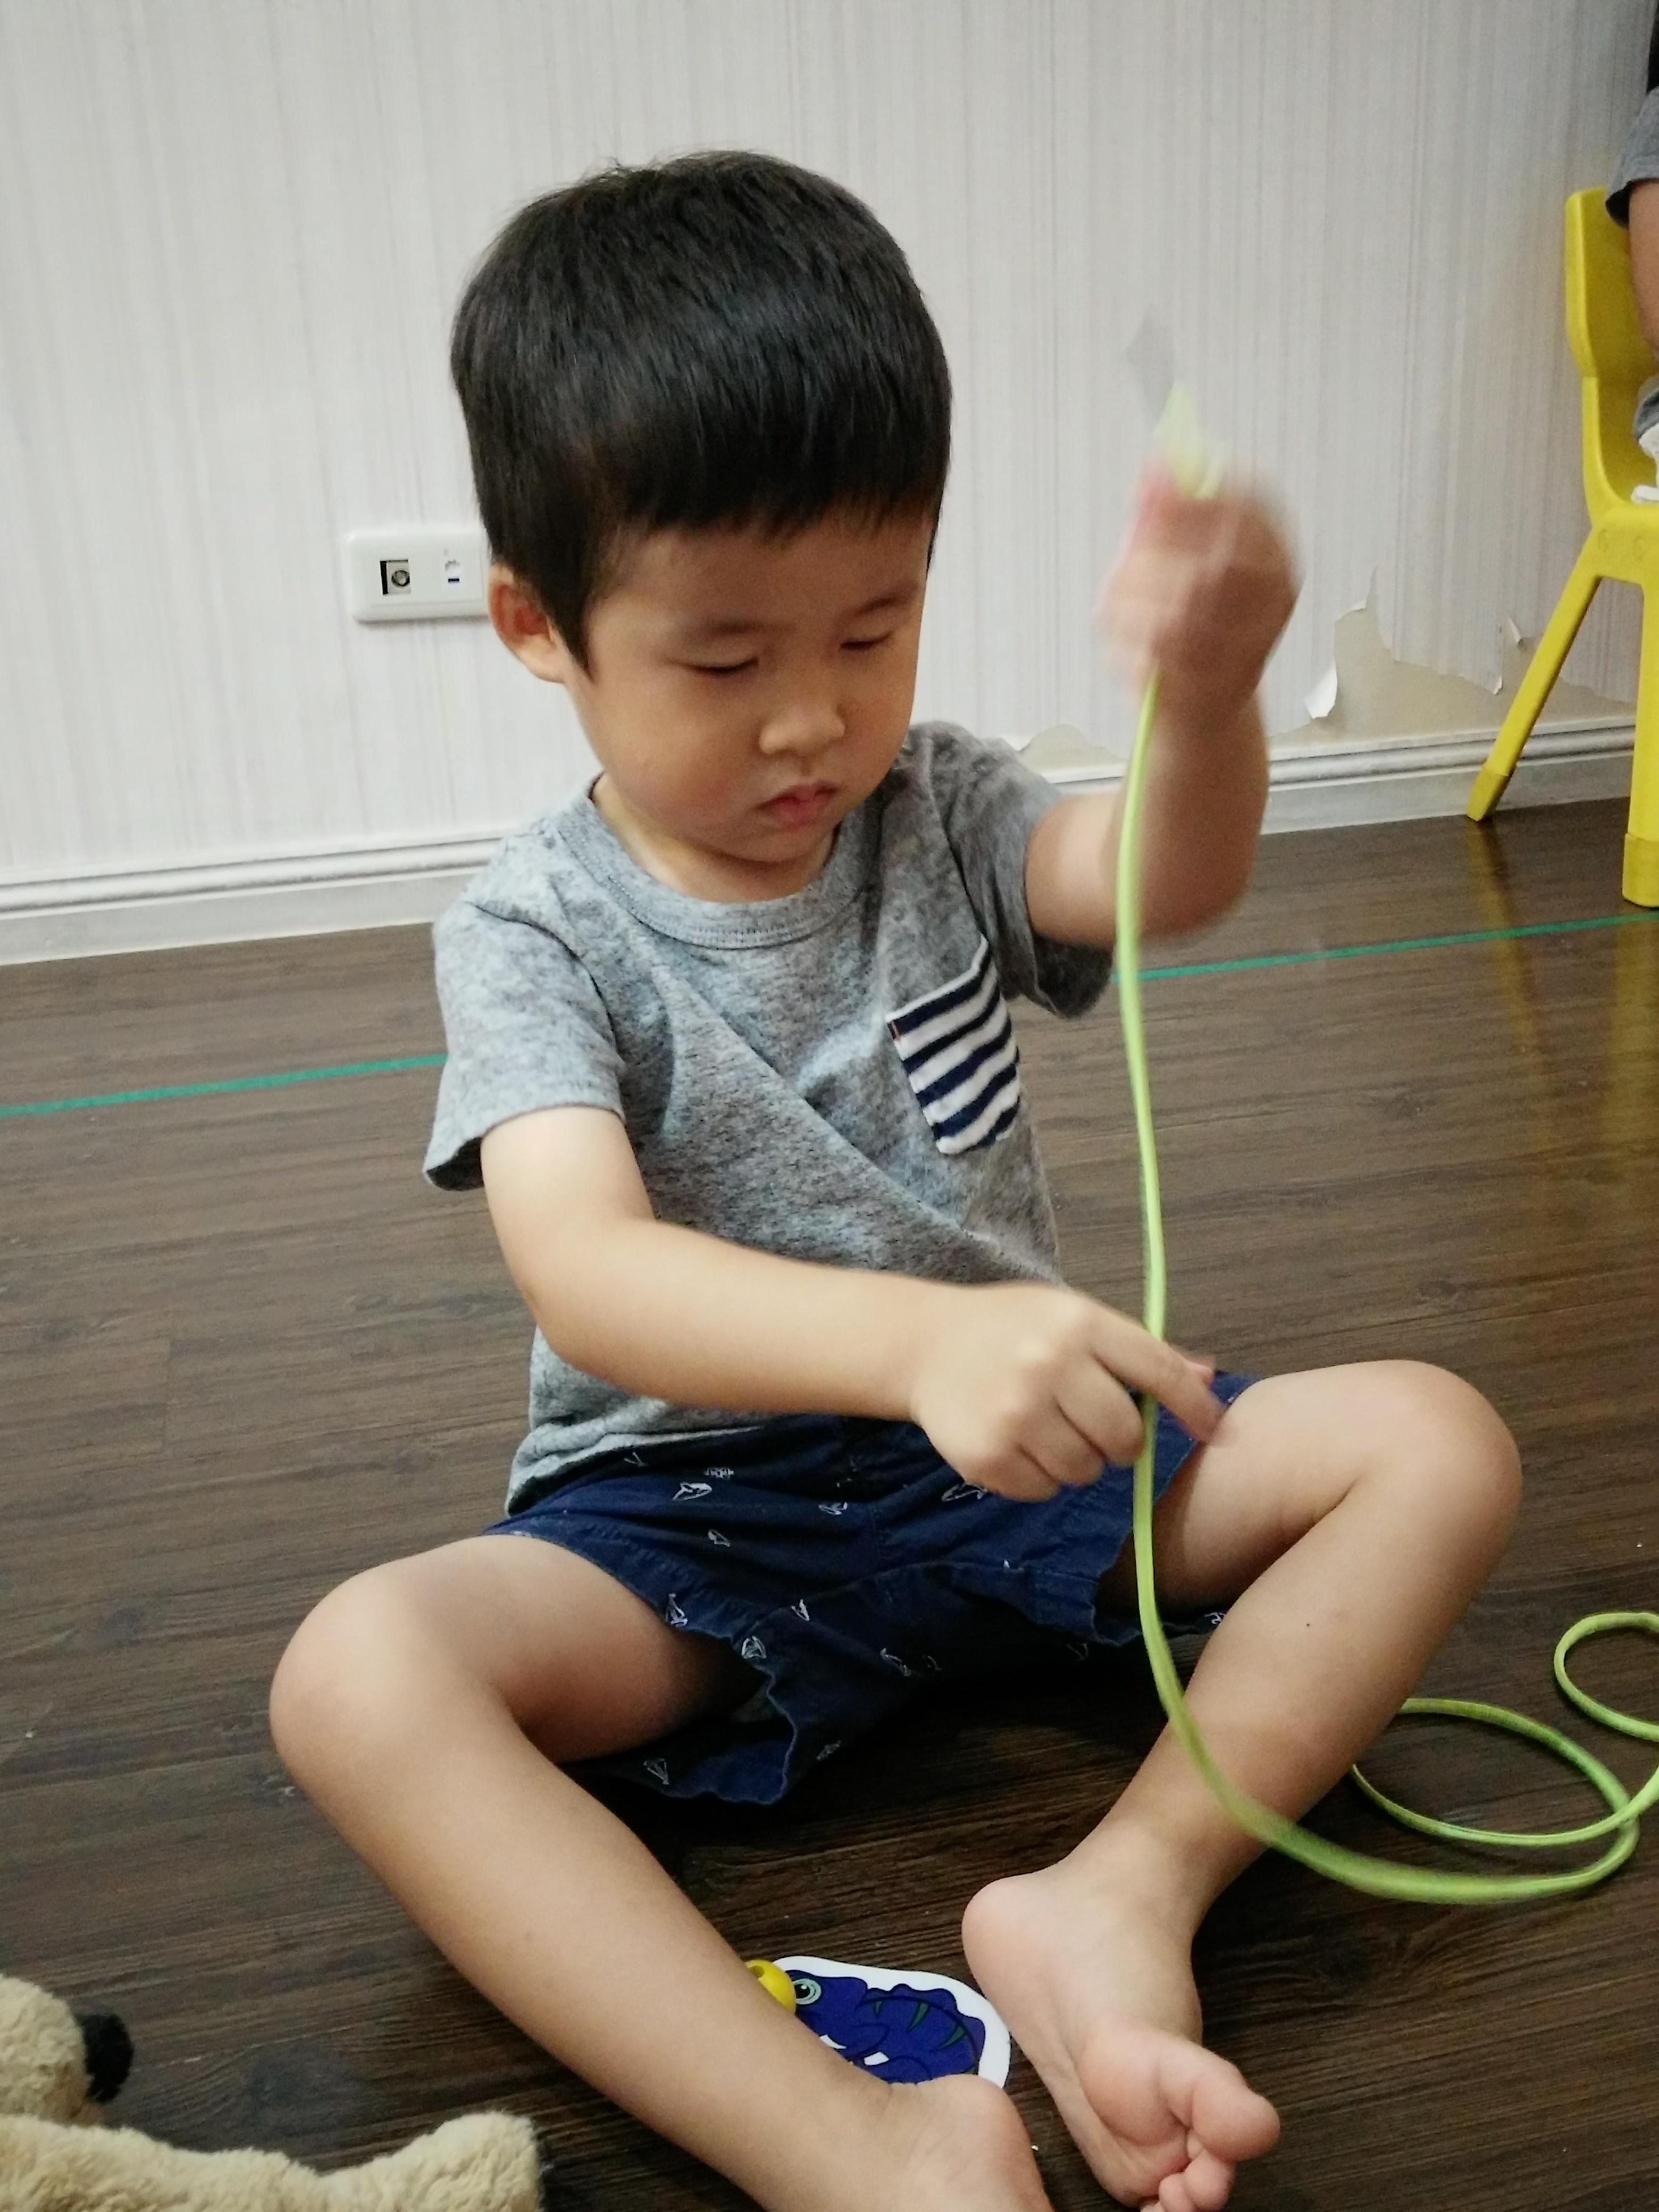 Ray threading beads2